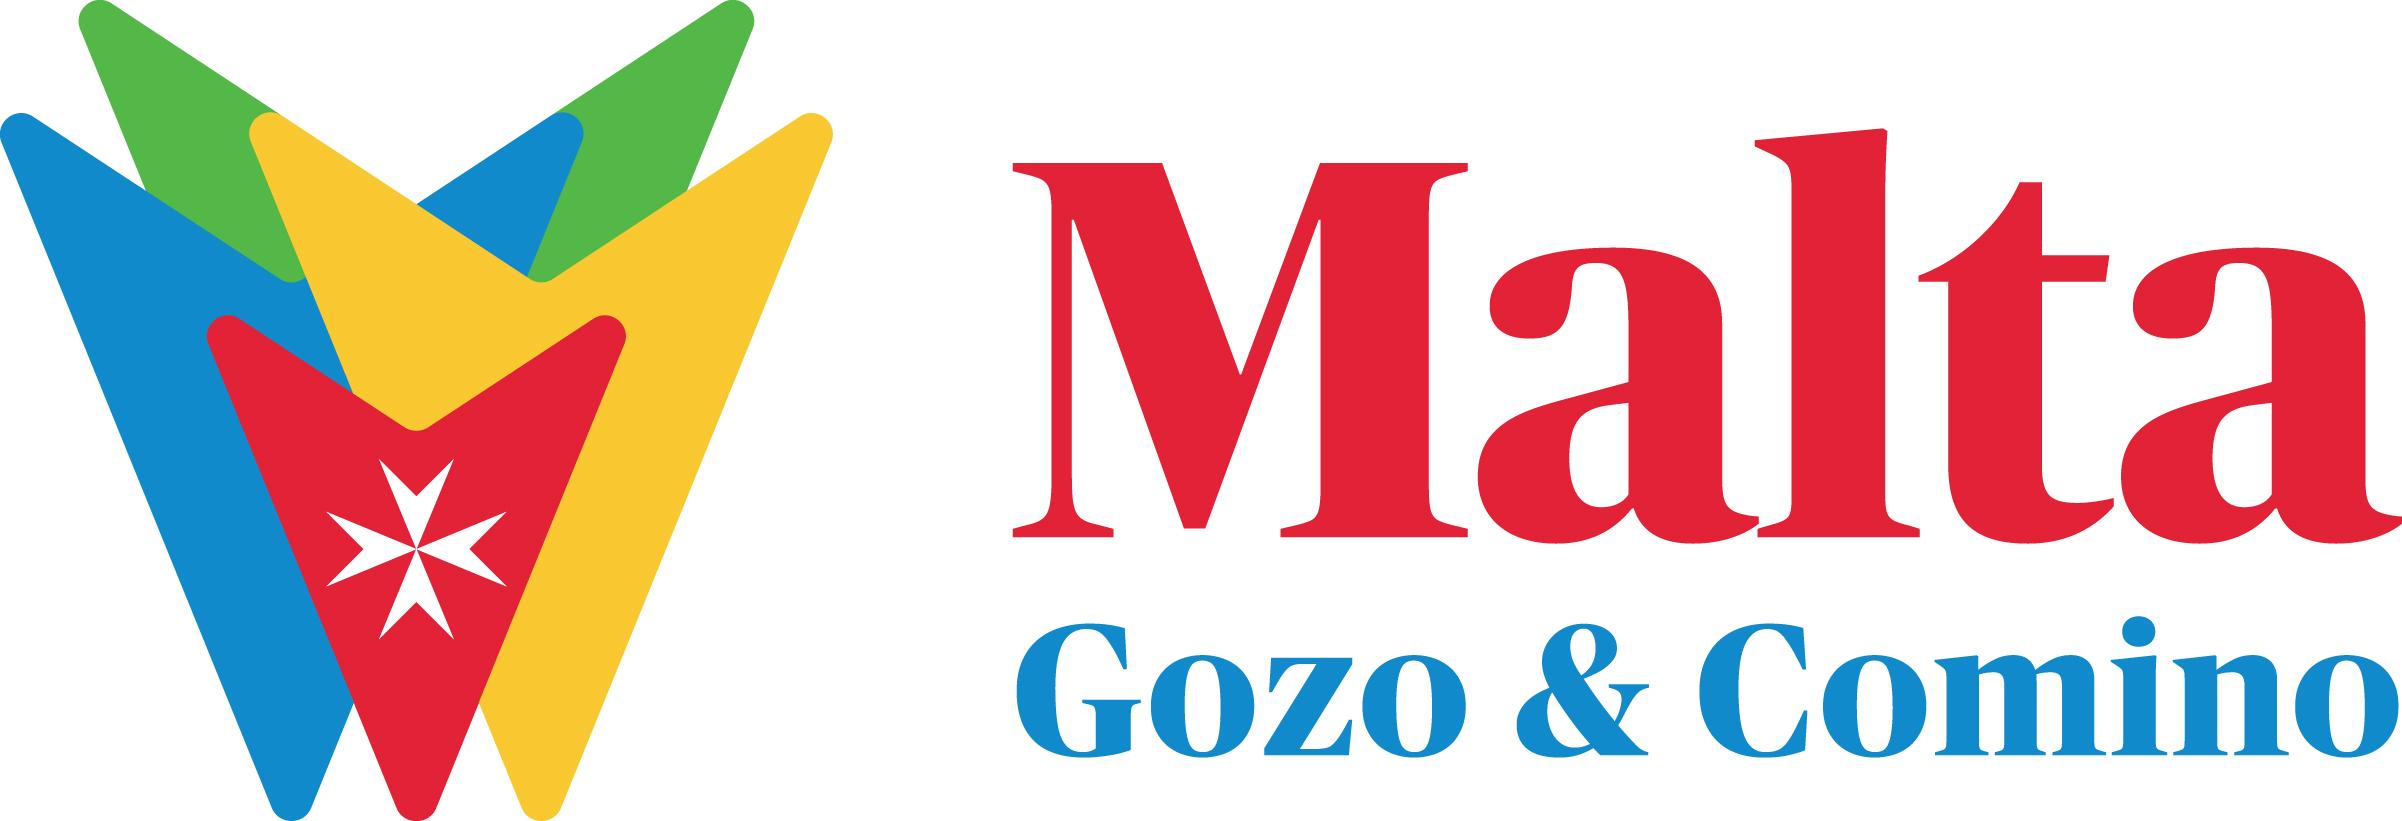 Malta Gozo & Comino LOGO.jpg